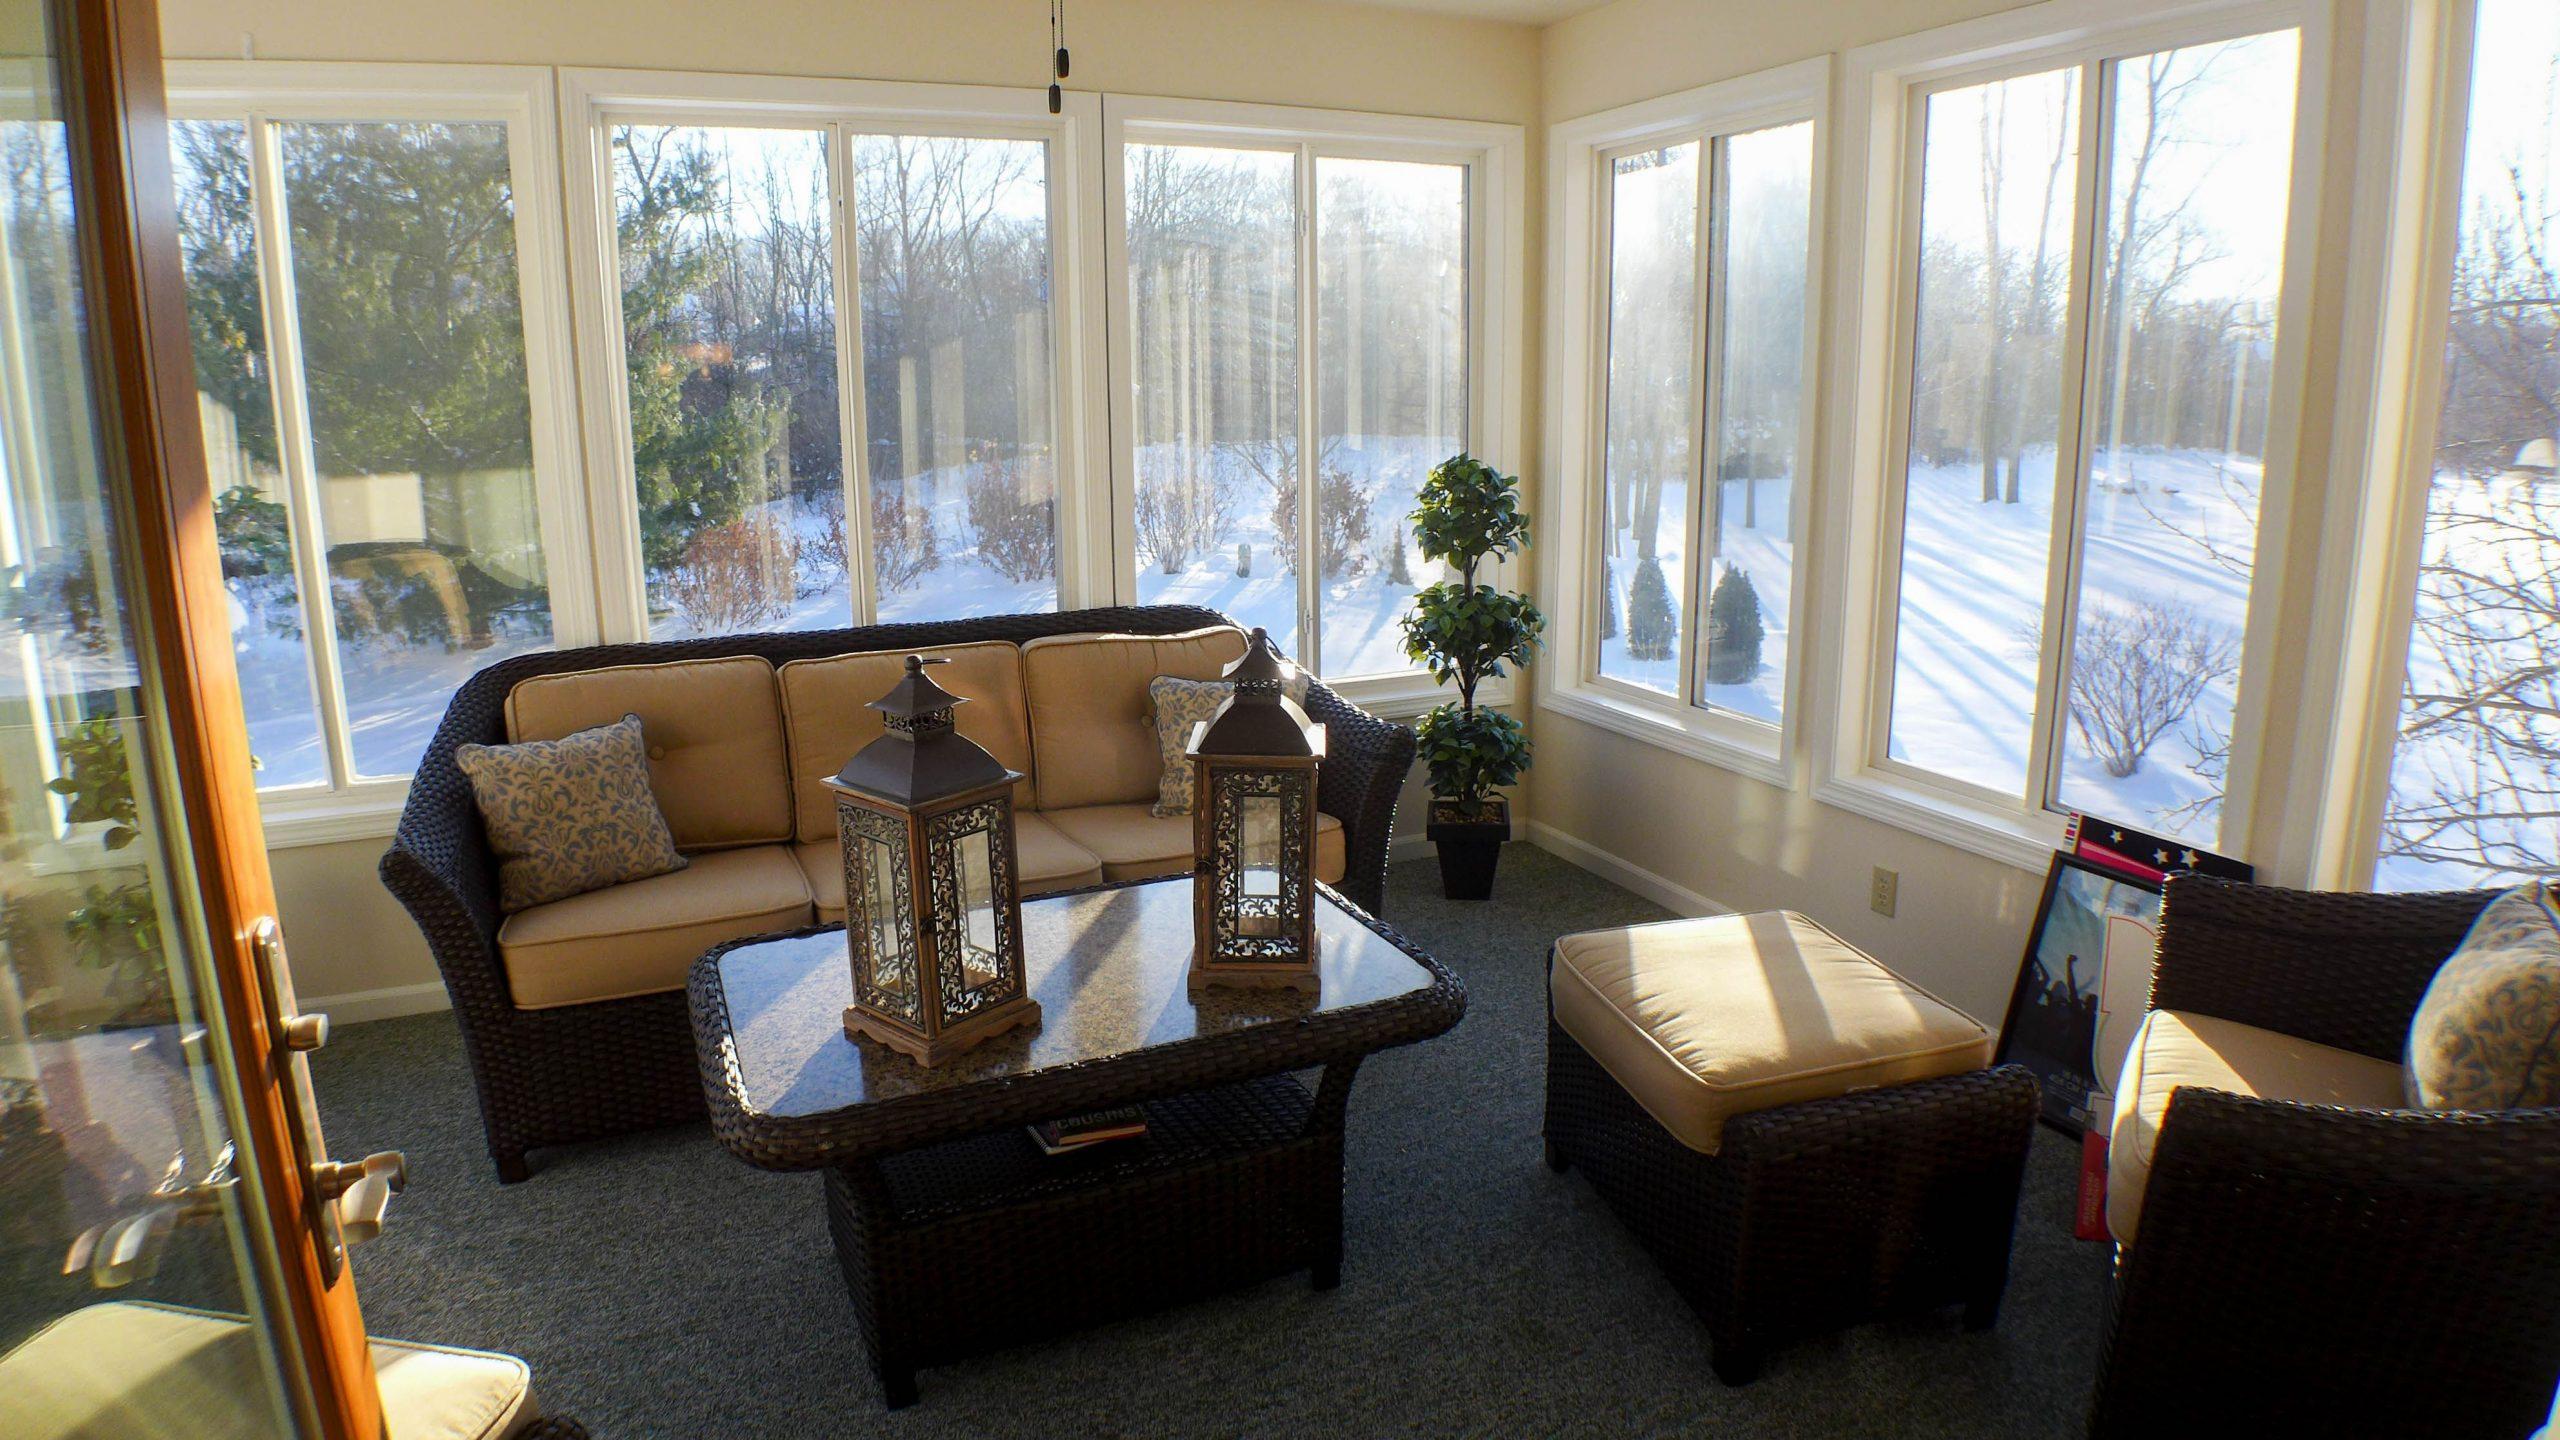 sunroom in winter dark furnitre with tan cushions nj custom sunroom builder